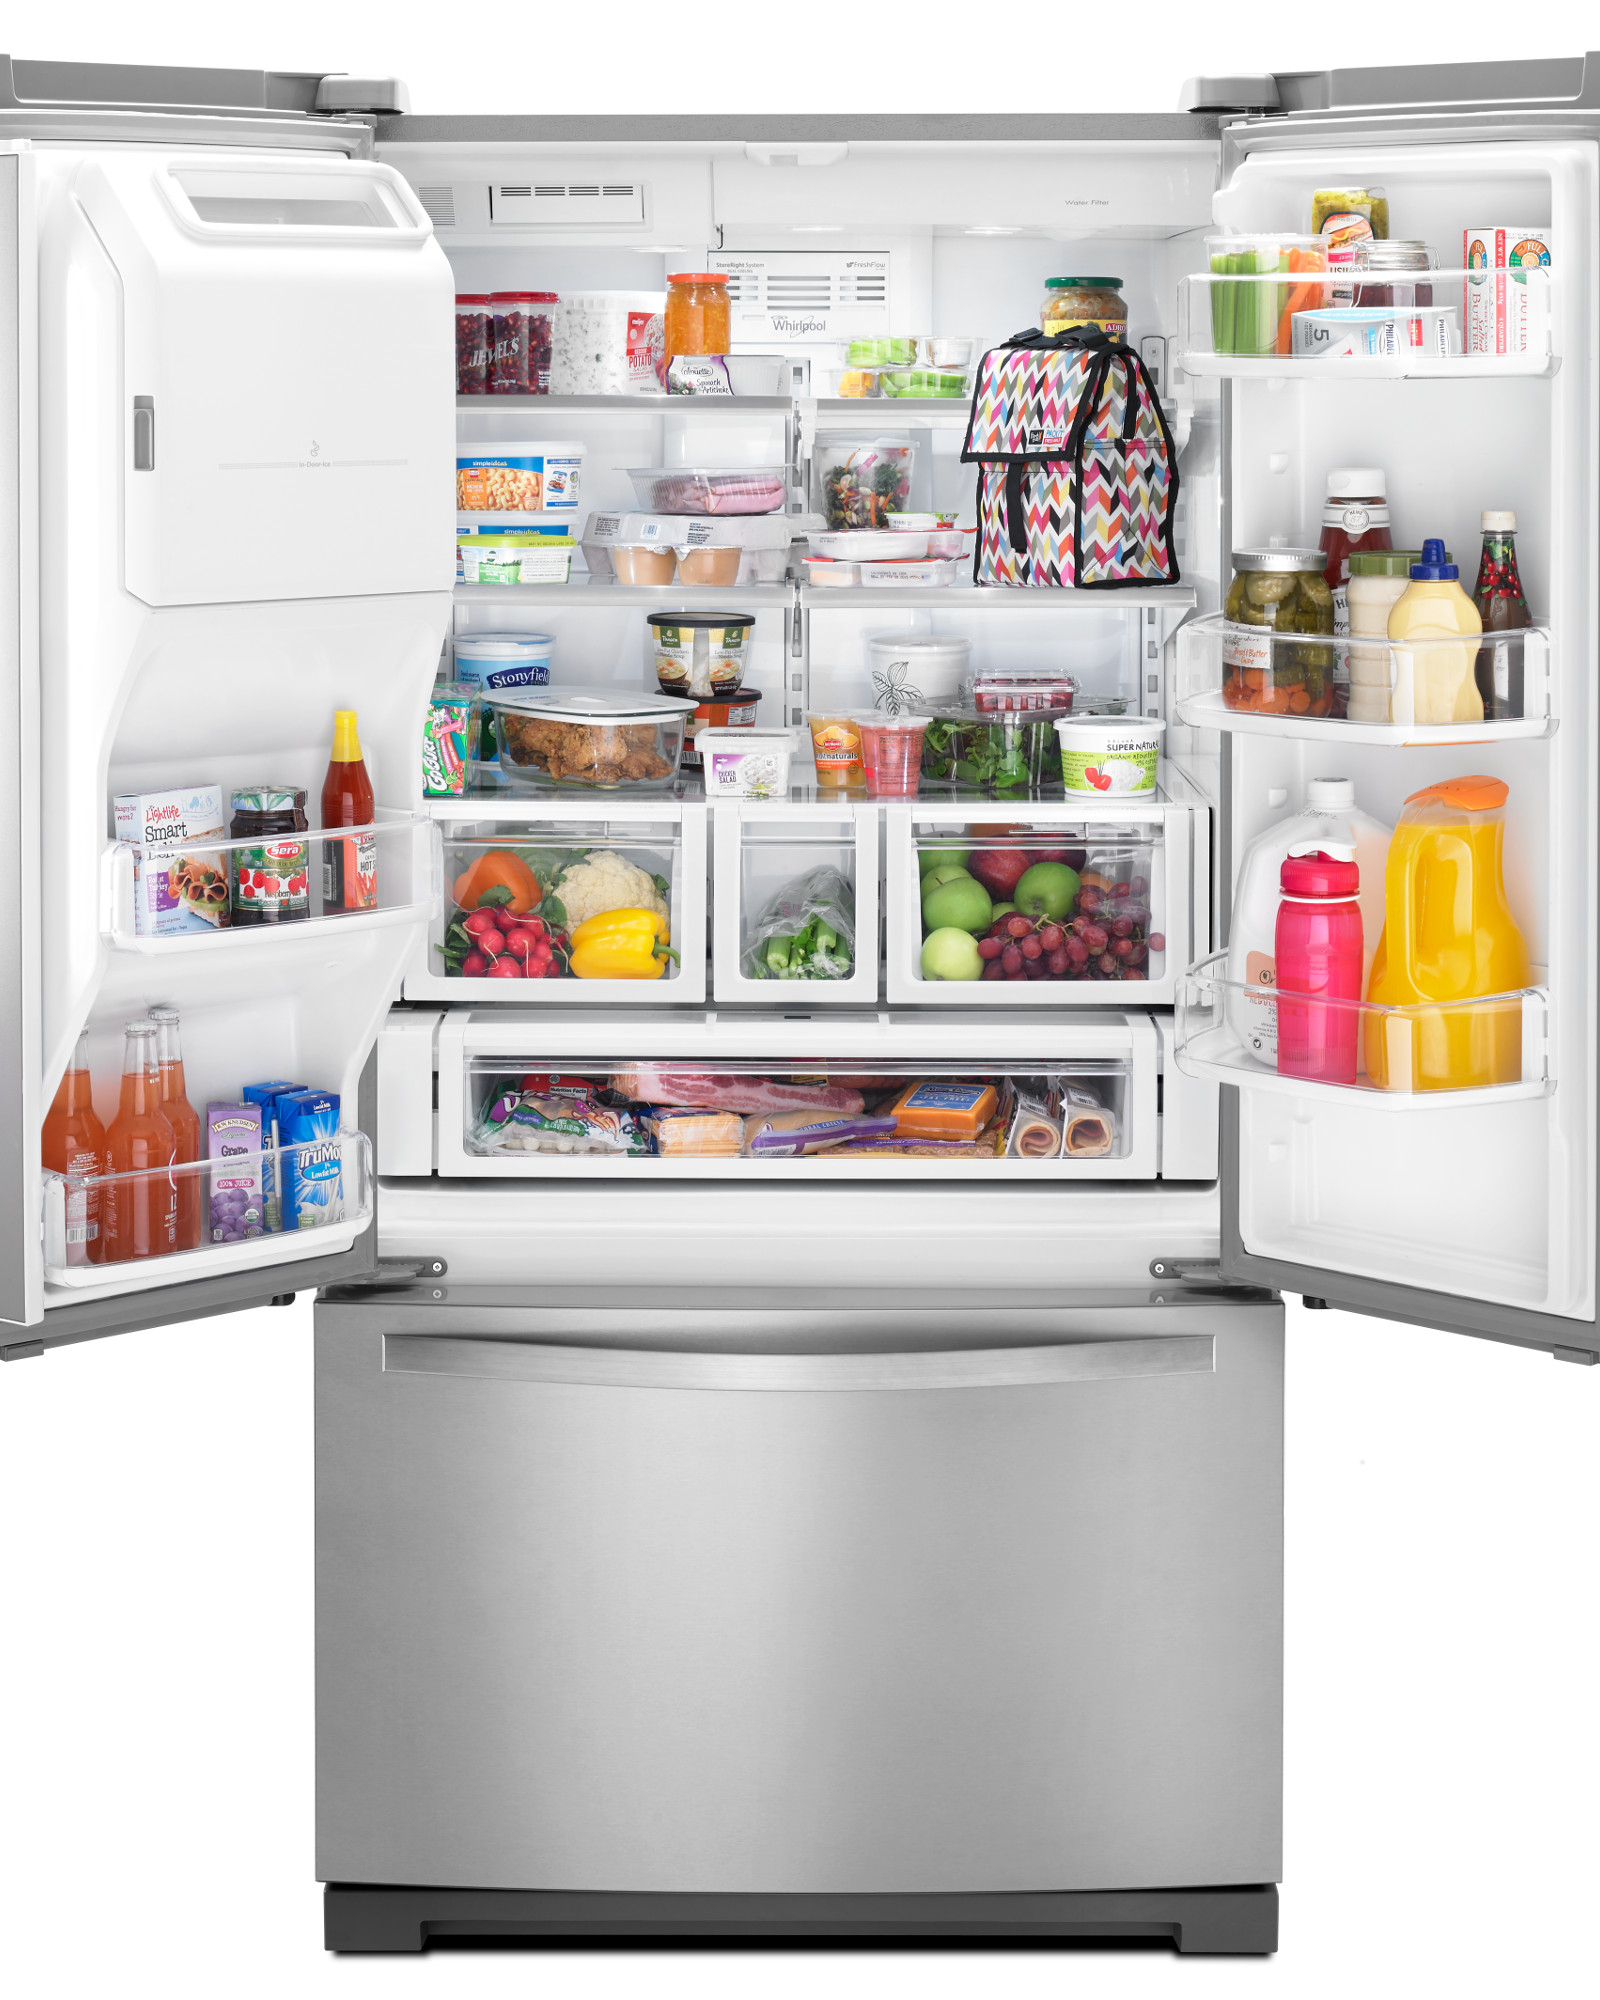 Whirlpool WRF757SDEM 27 cu. ft. French Door Bottom-Freezer Refrigerator - Stainless Steel